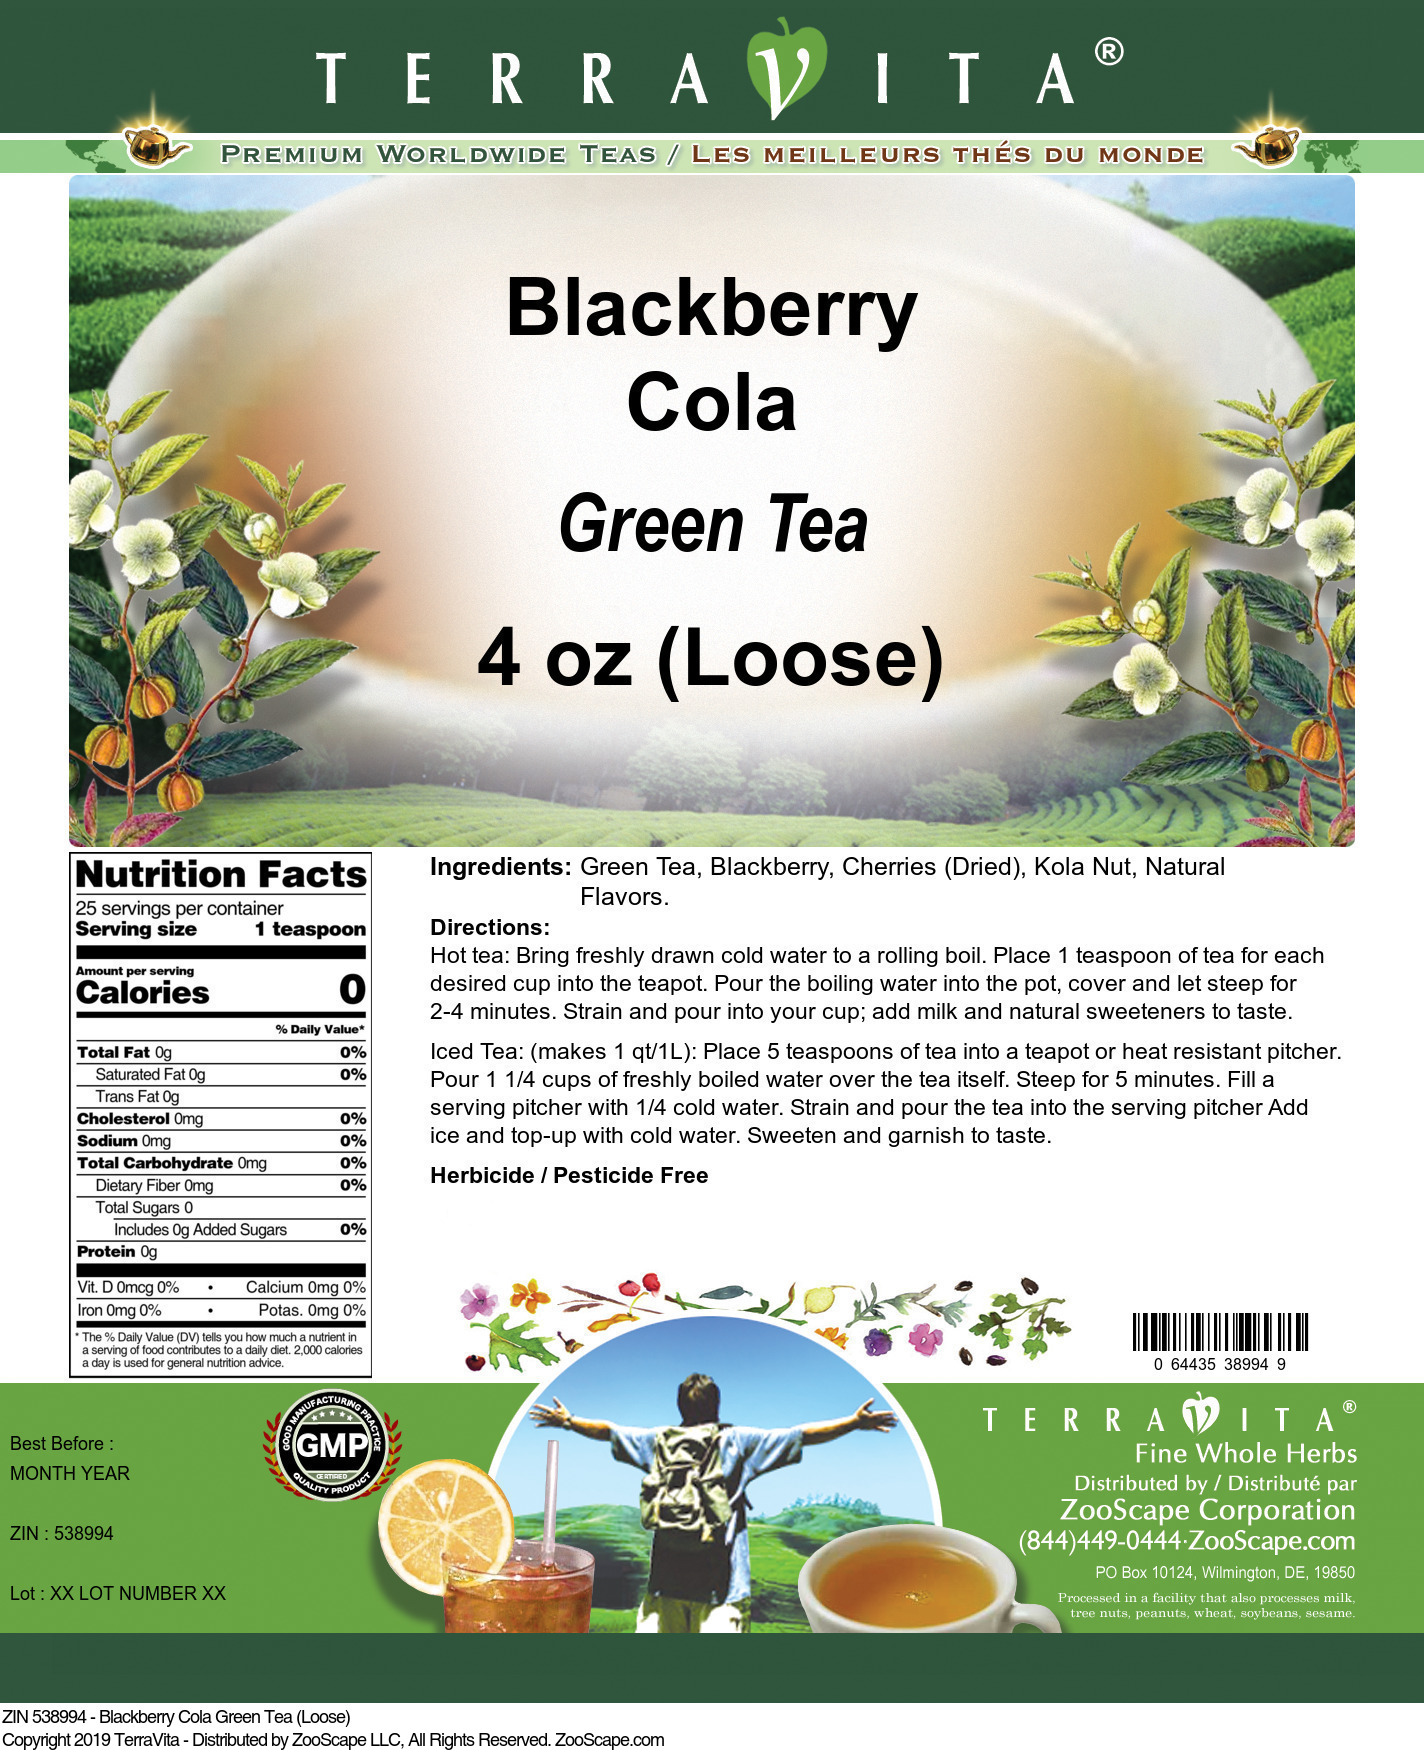 Blackberry Cola Green Tea (Loose)